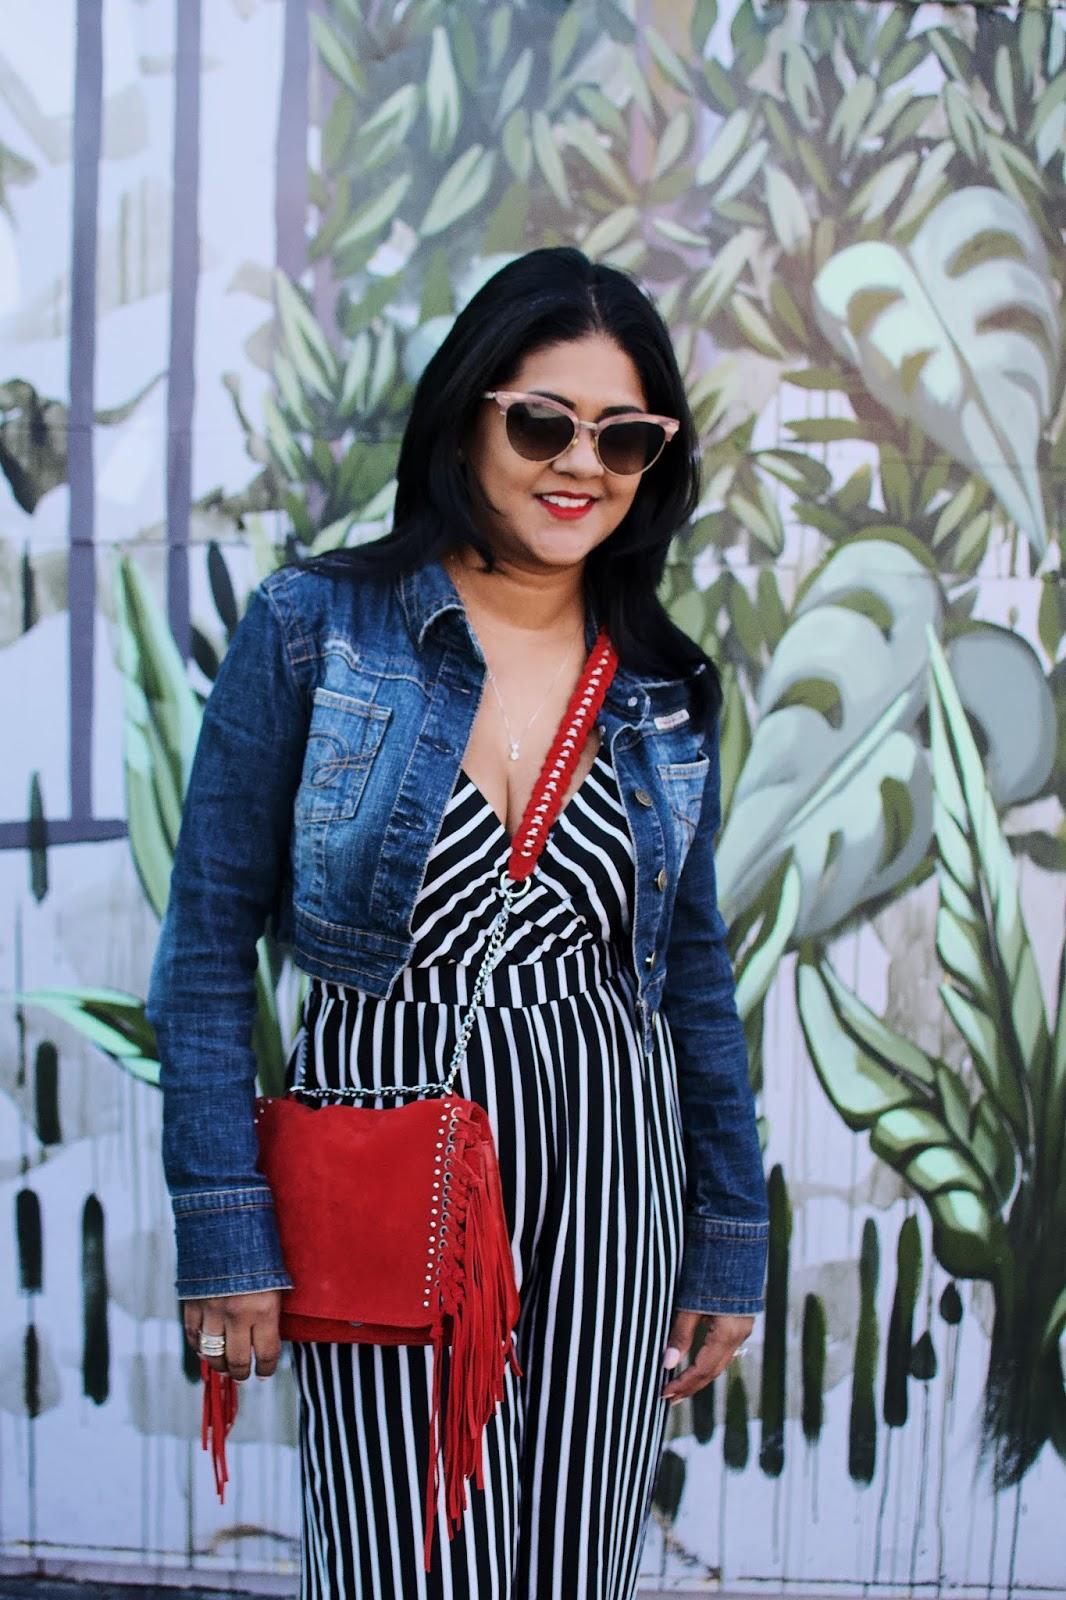 Wynwood walls, black and white jumpsuit, zara purse